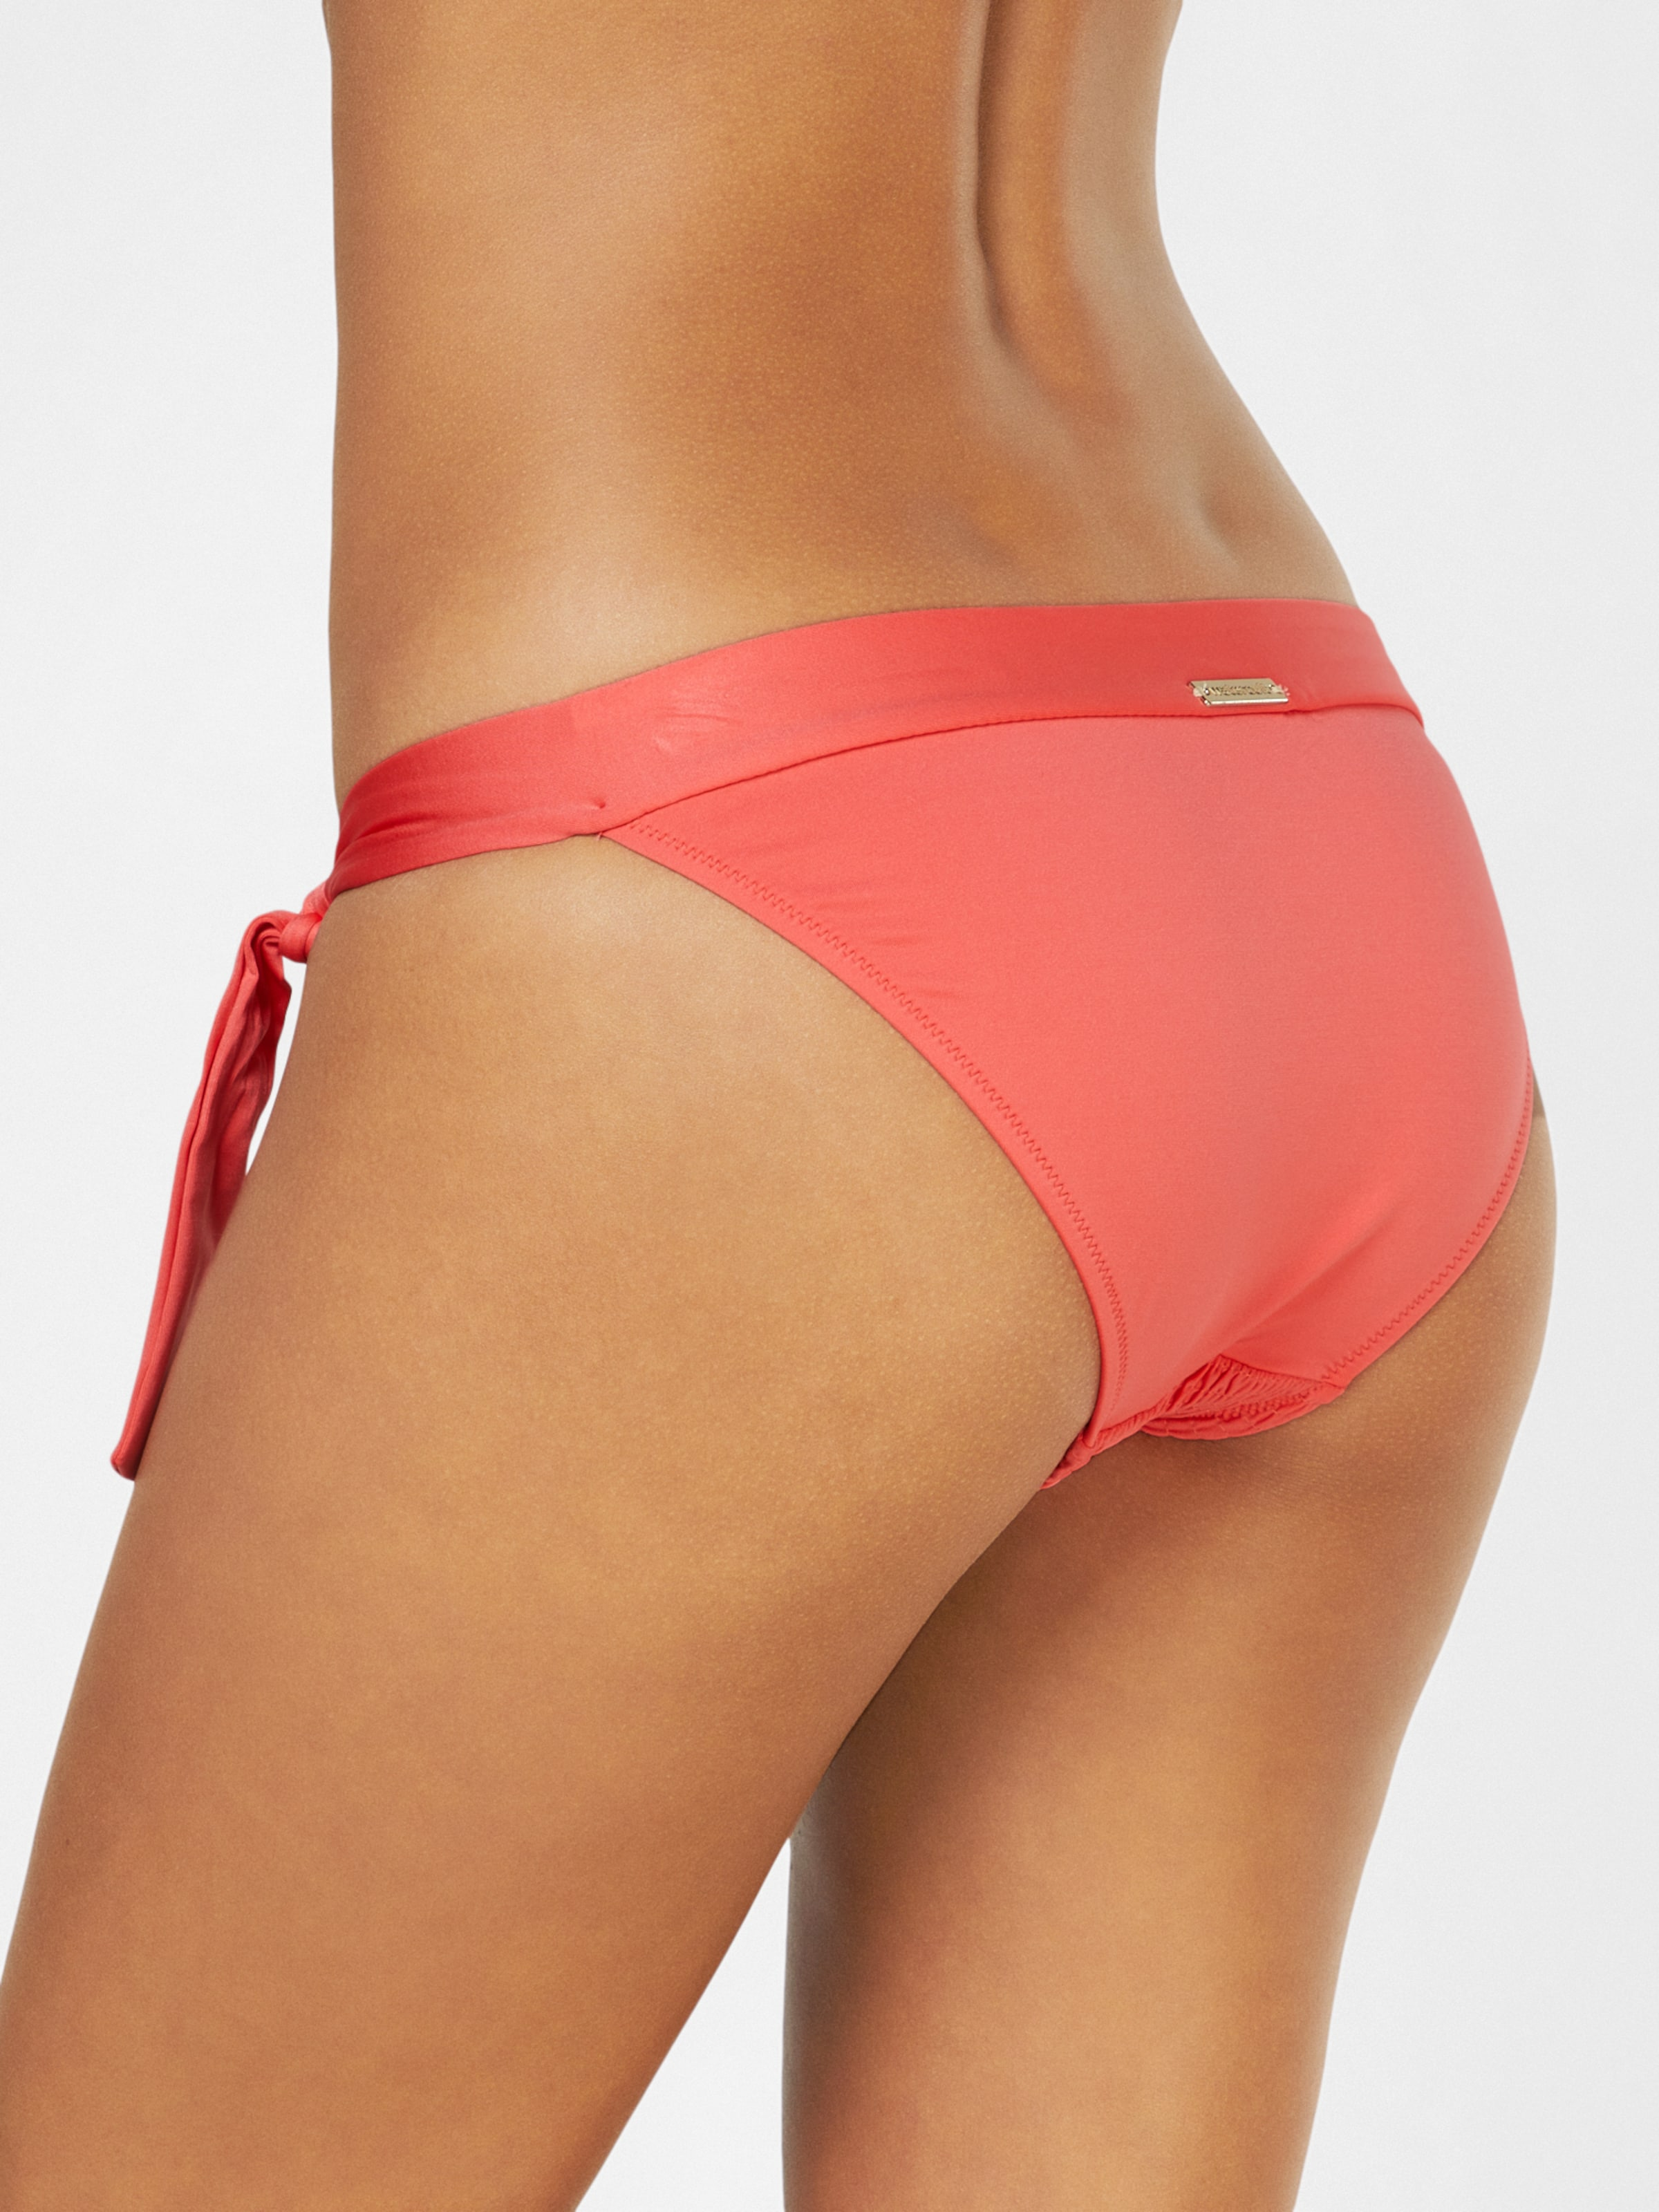 Bikini De Homard Watercult En Bas 6Yfb7yg